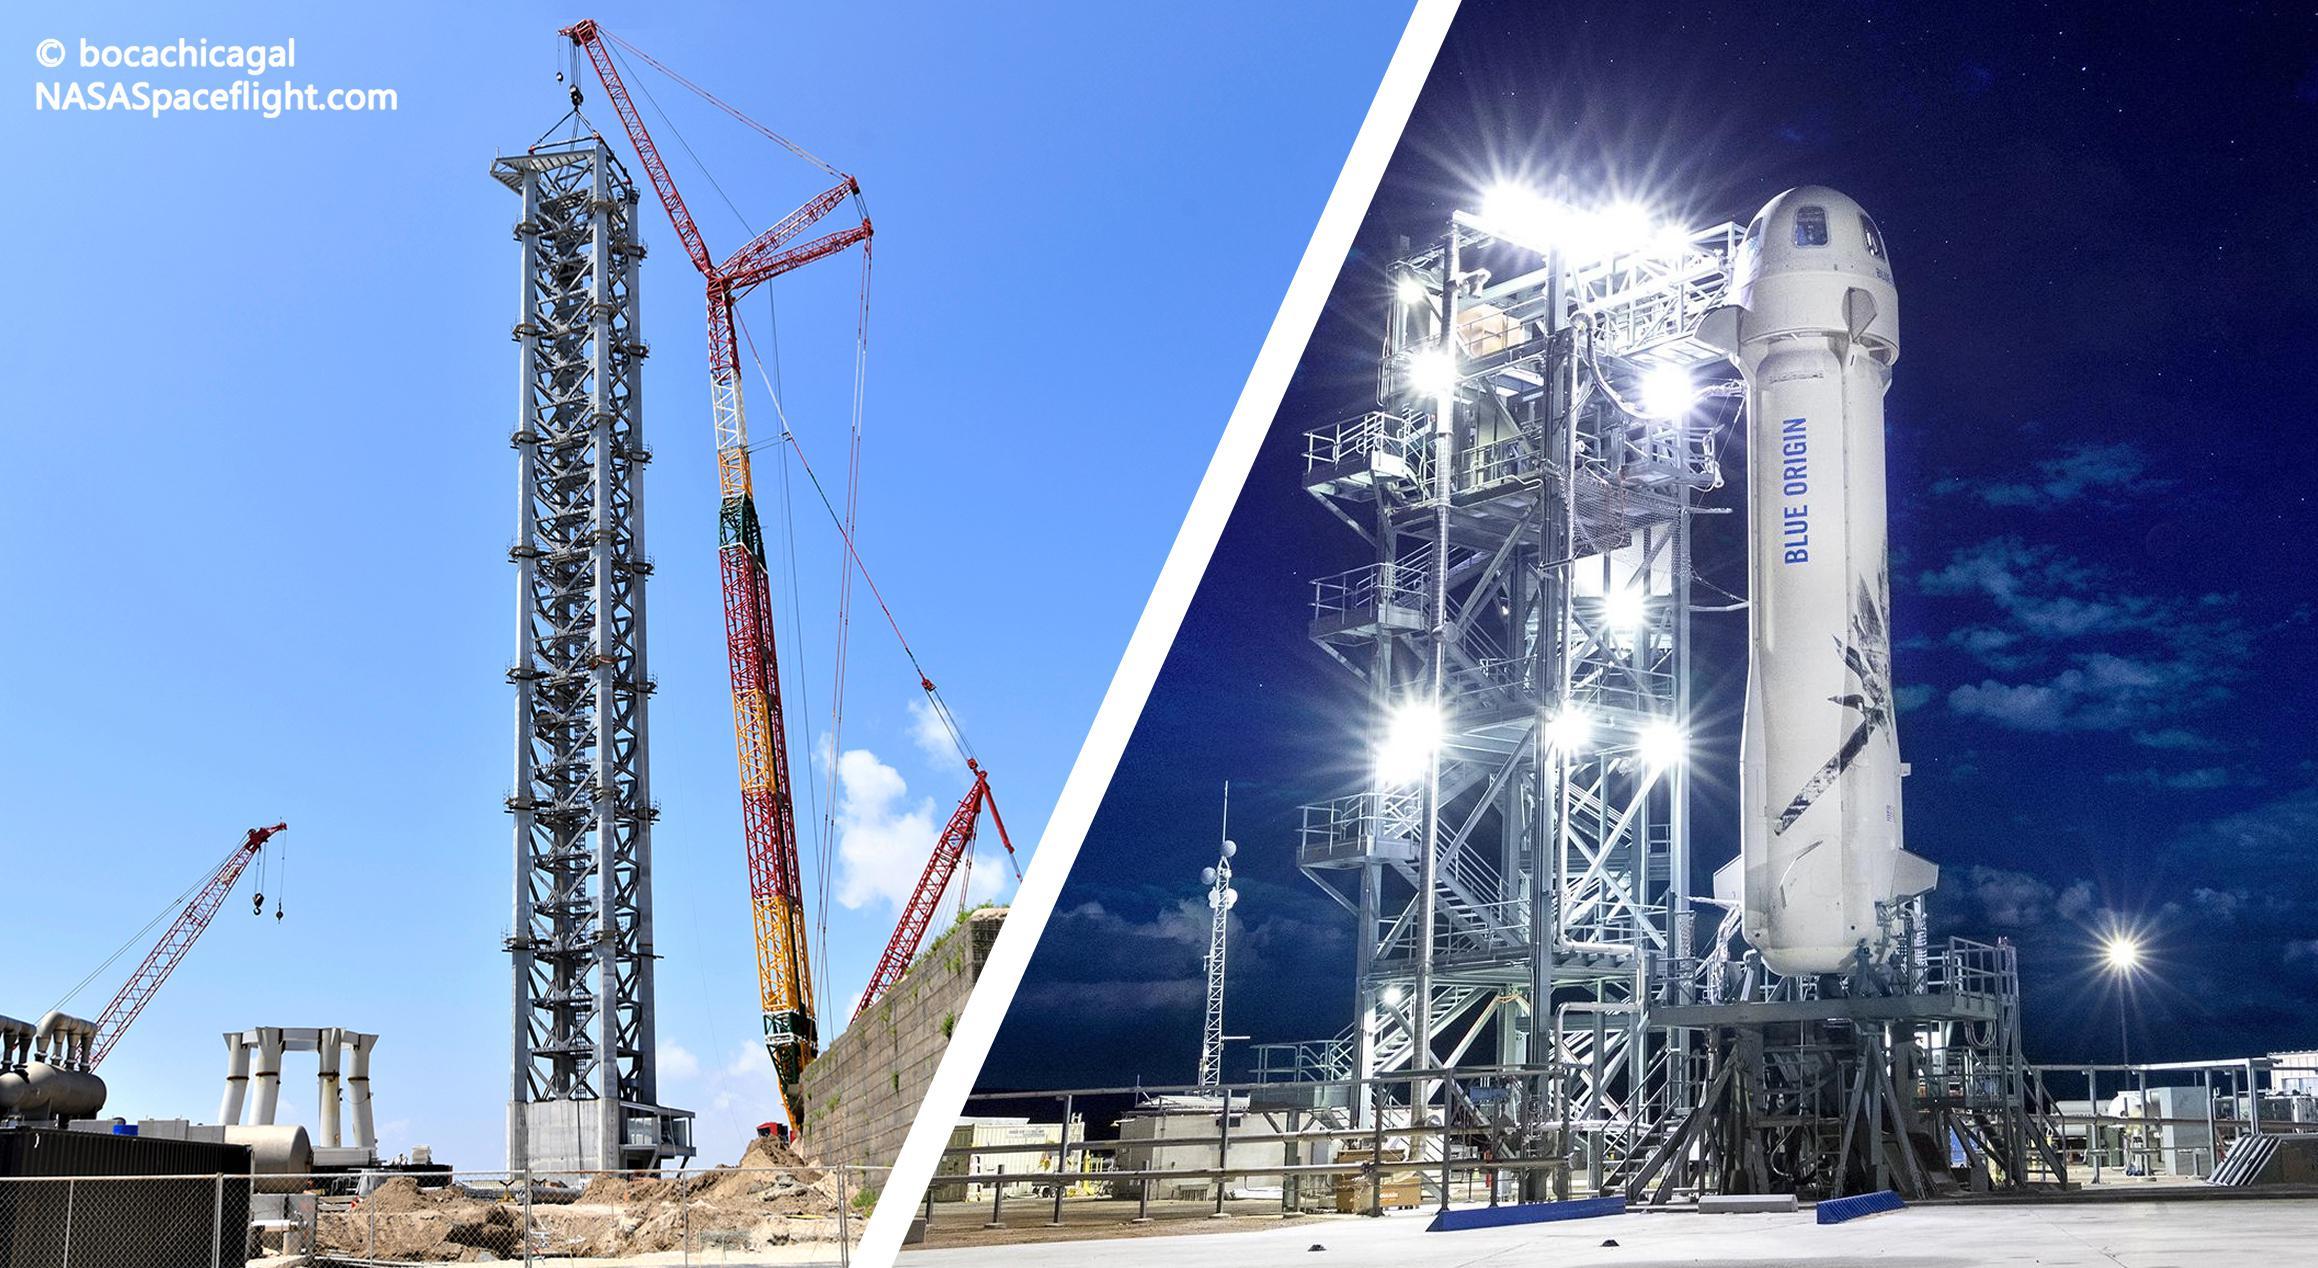 Blue Origin NS8 vs Starship tower stack #8 (Blue Origin & NSF – bocachicagal) 1 (c)